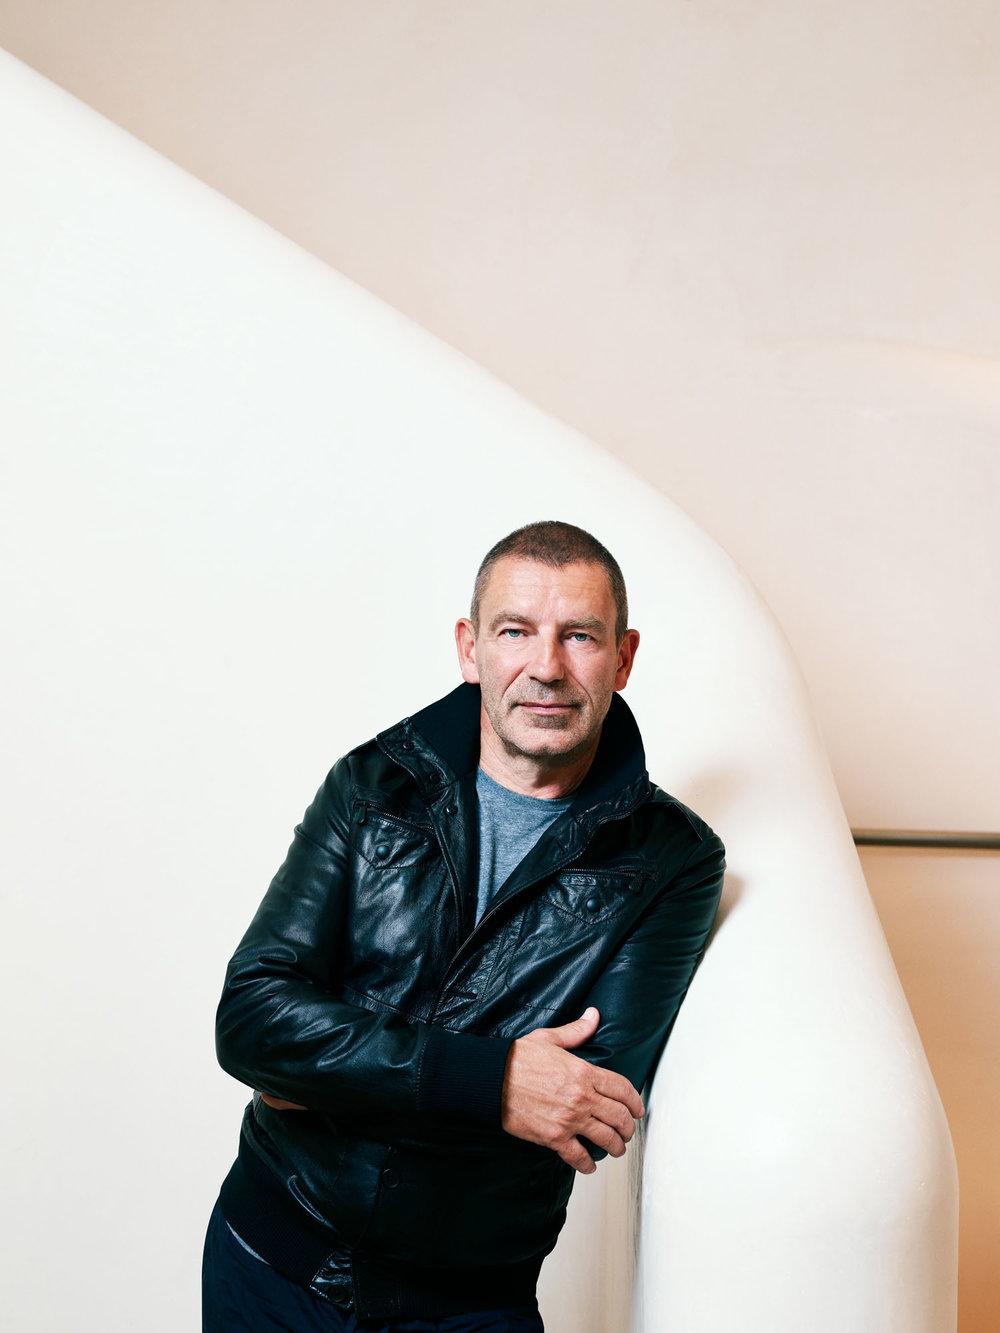 Tomas Maier, Creative Director at Bottega Veneta